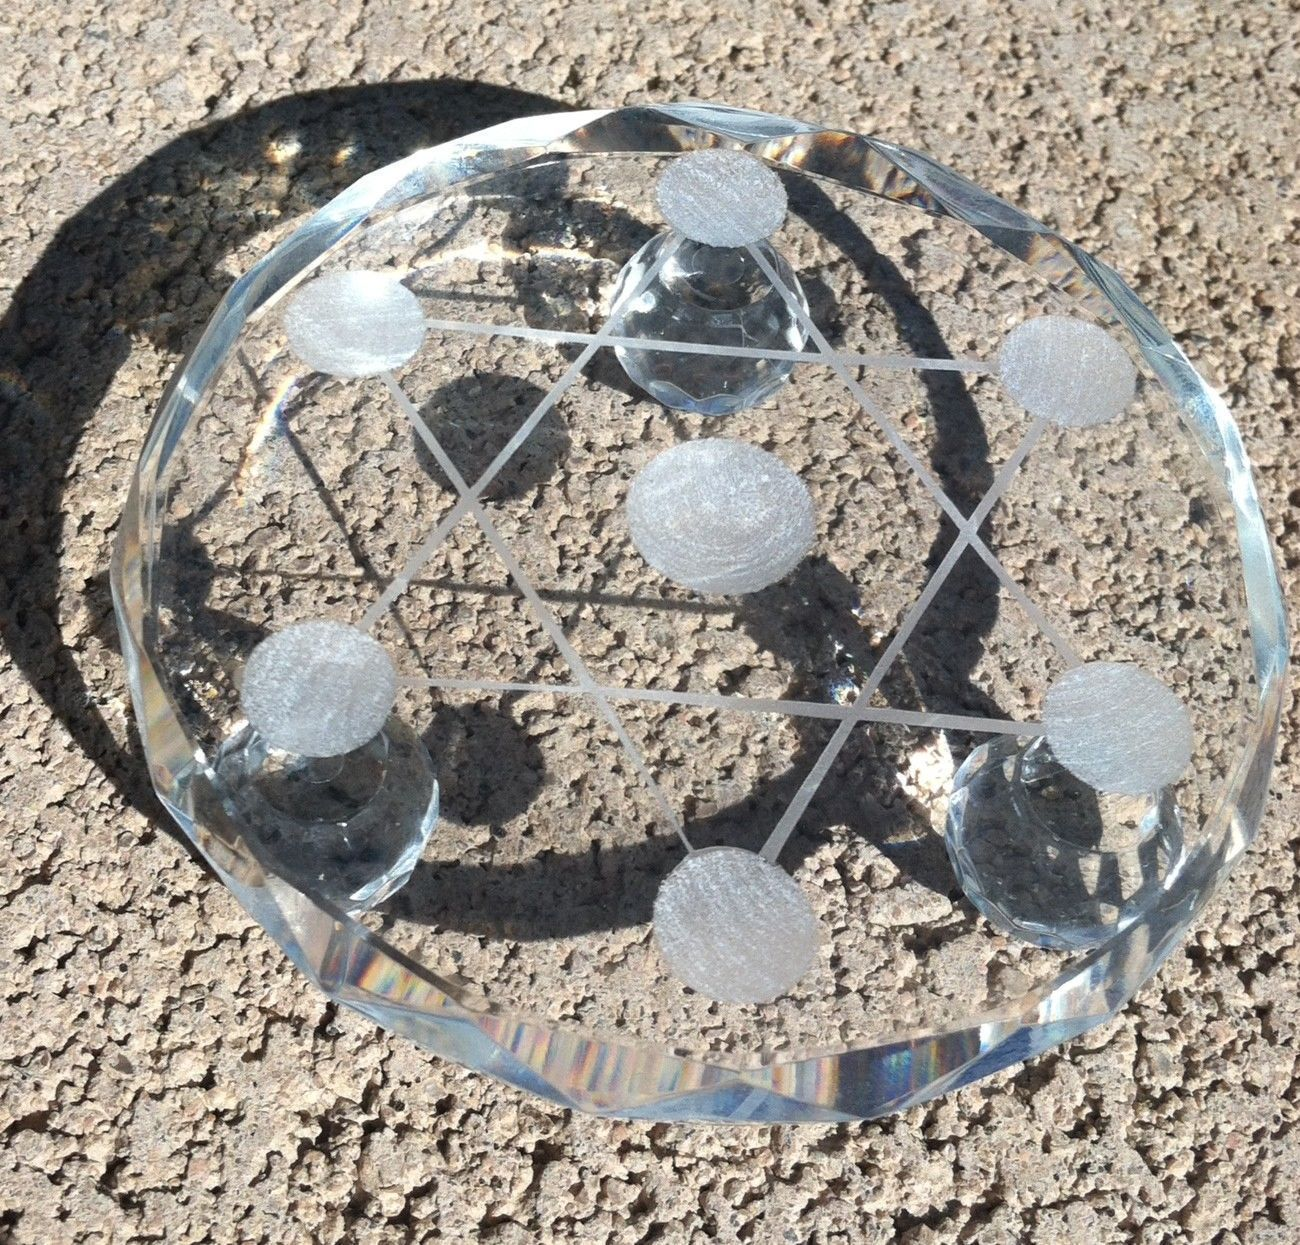 Details about Natural Clear Quartz Crystal Ball Meditation